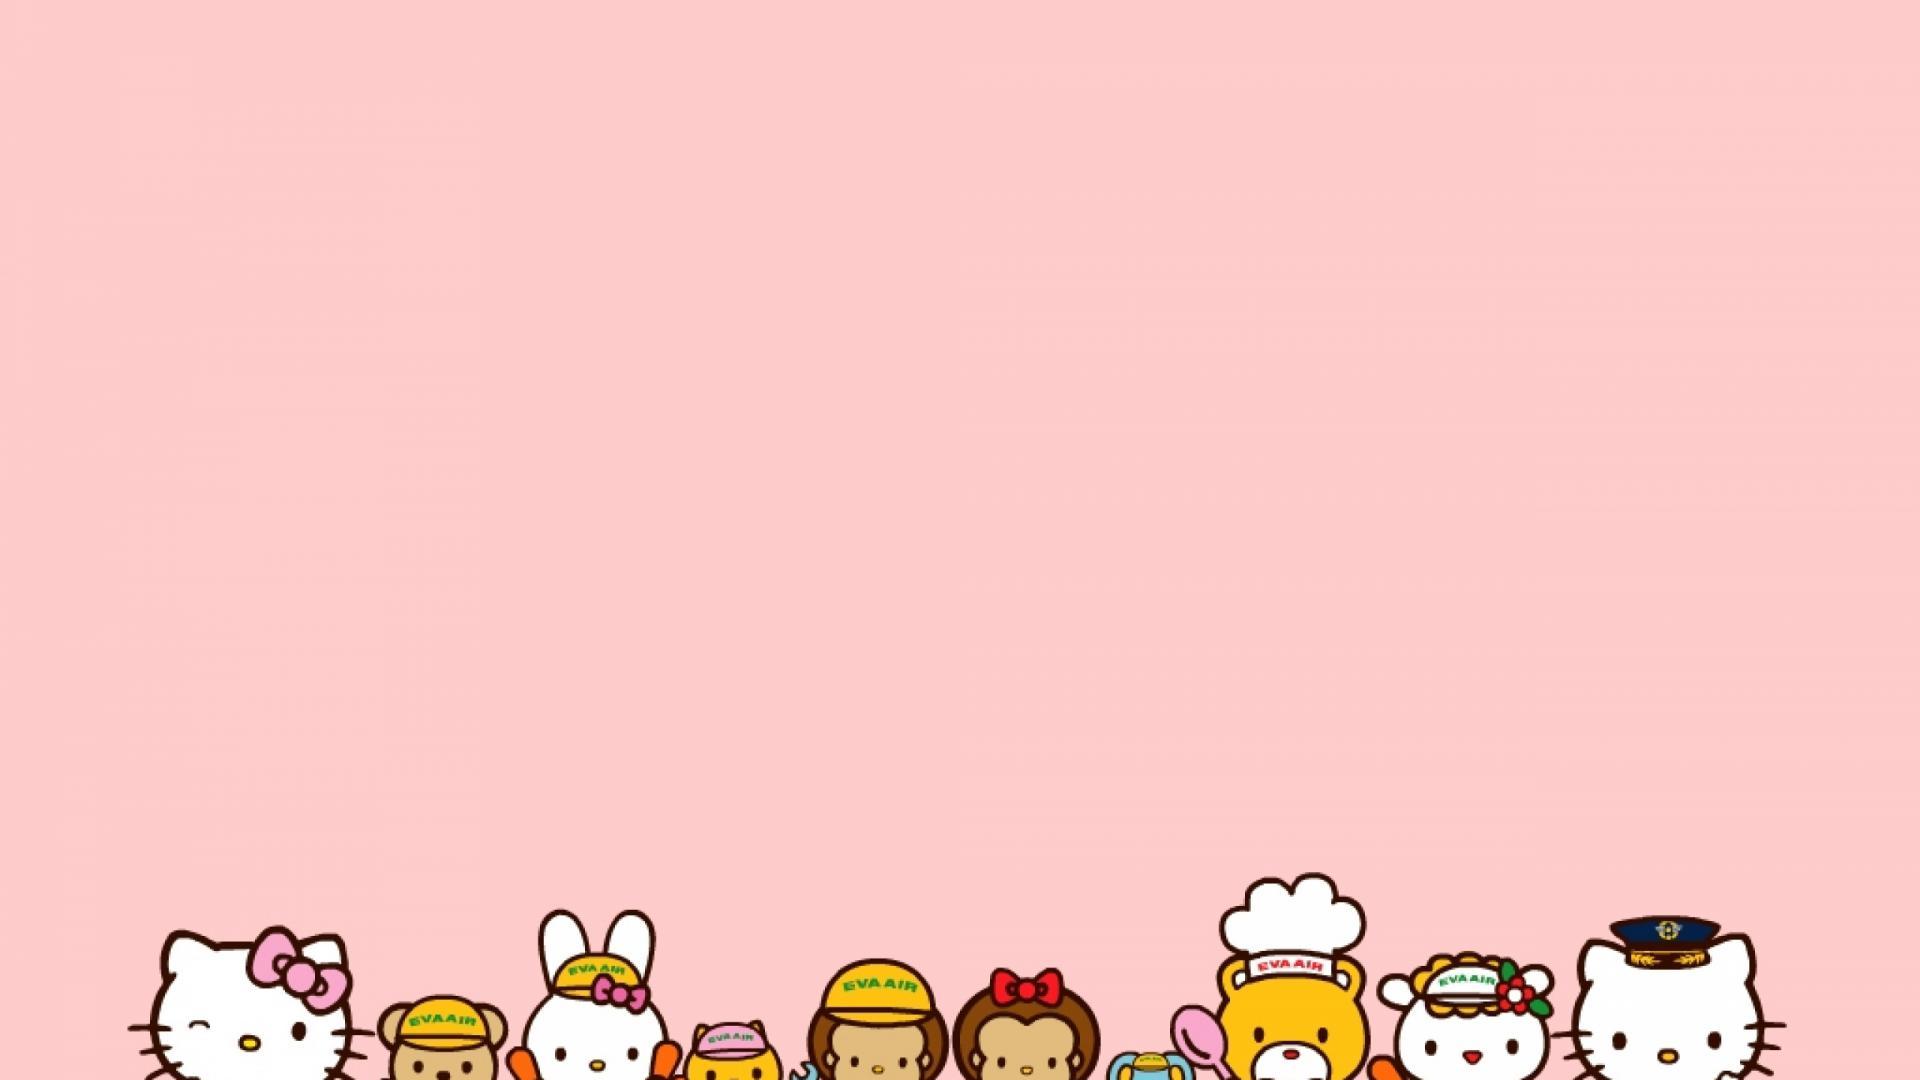 Download sanrio wallpaper hd 1920x1080 77 sanrio - Wallpaper hello kitty full hd ...